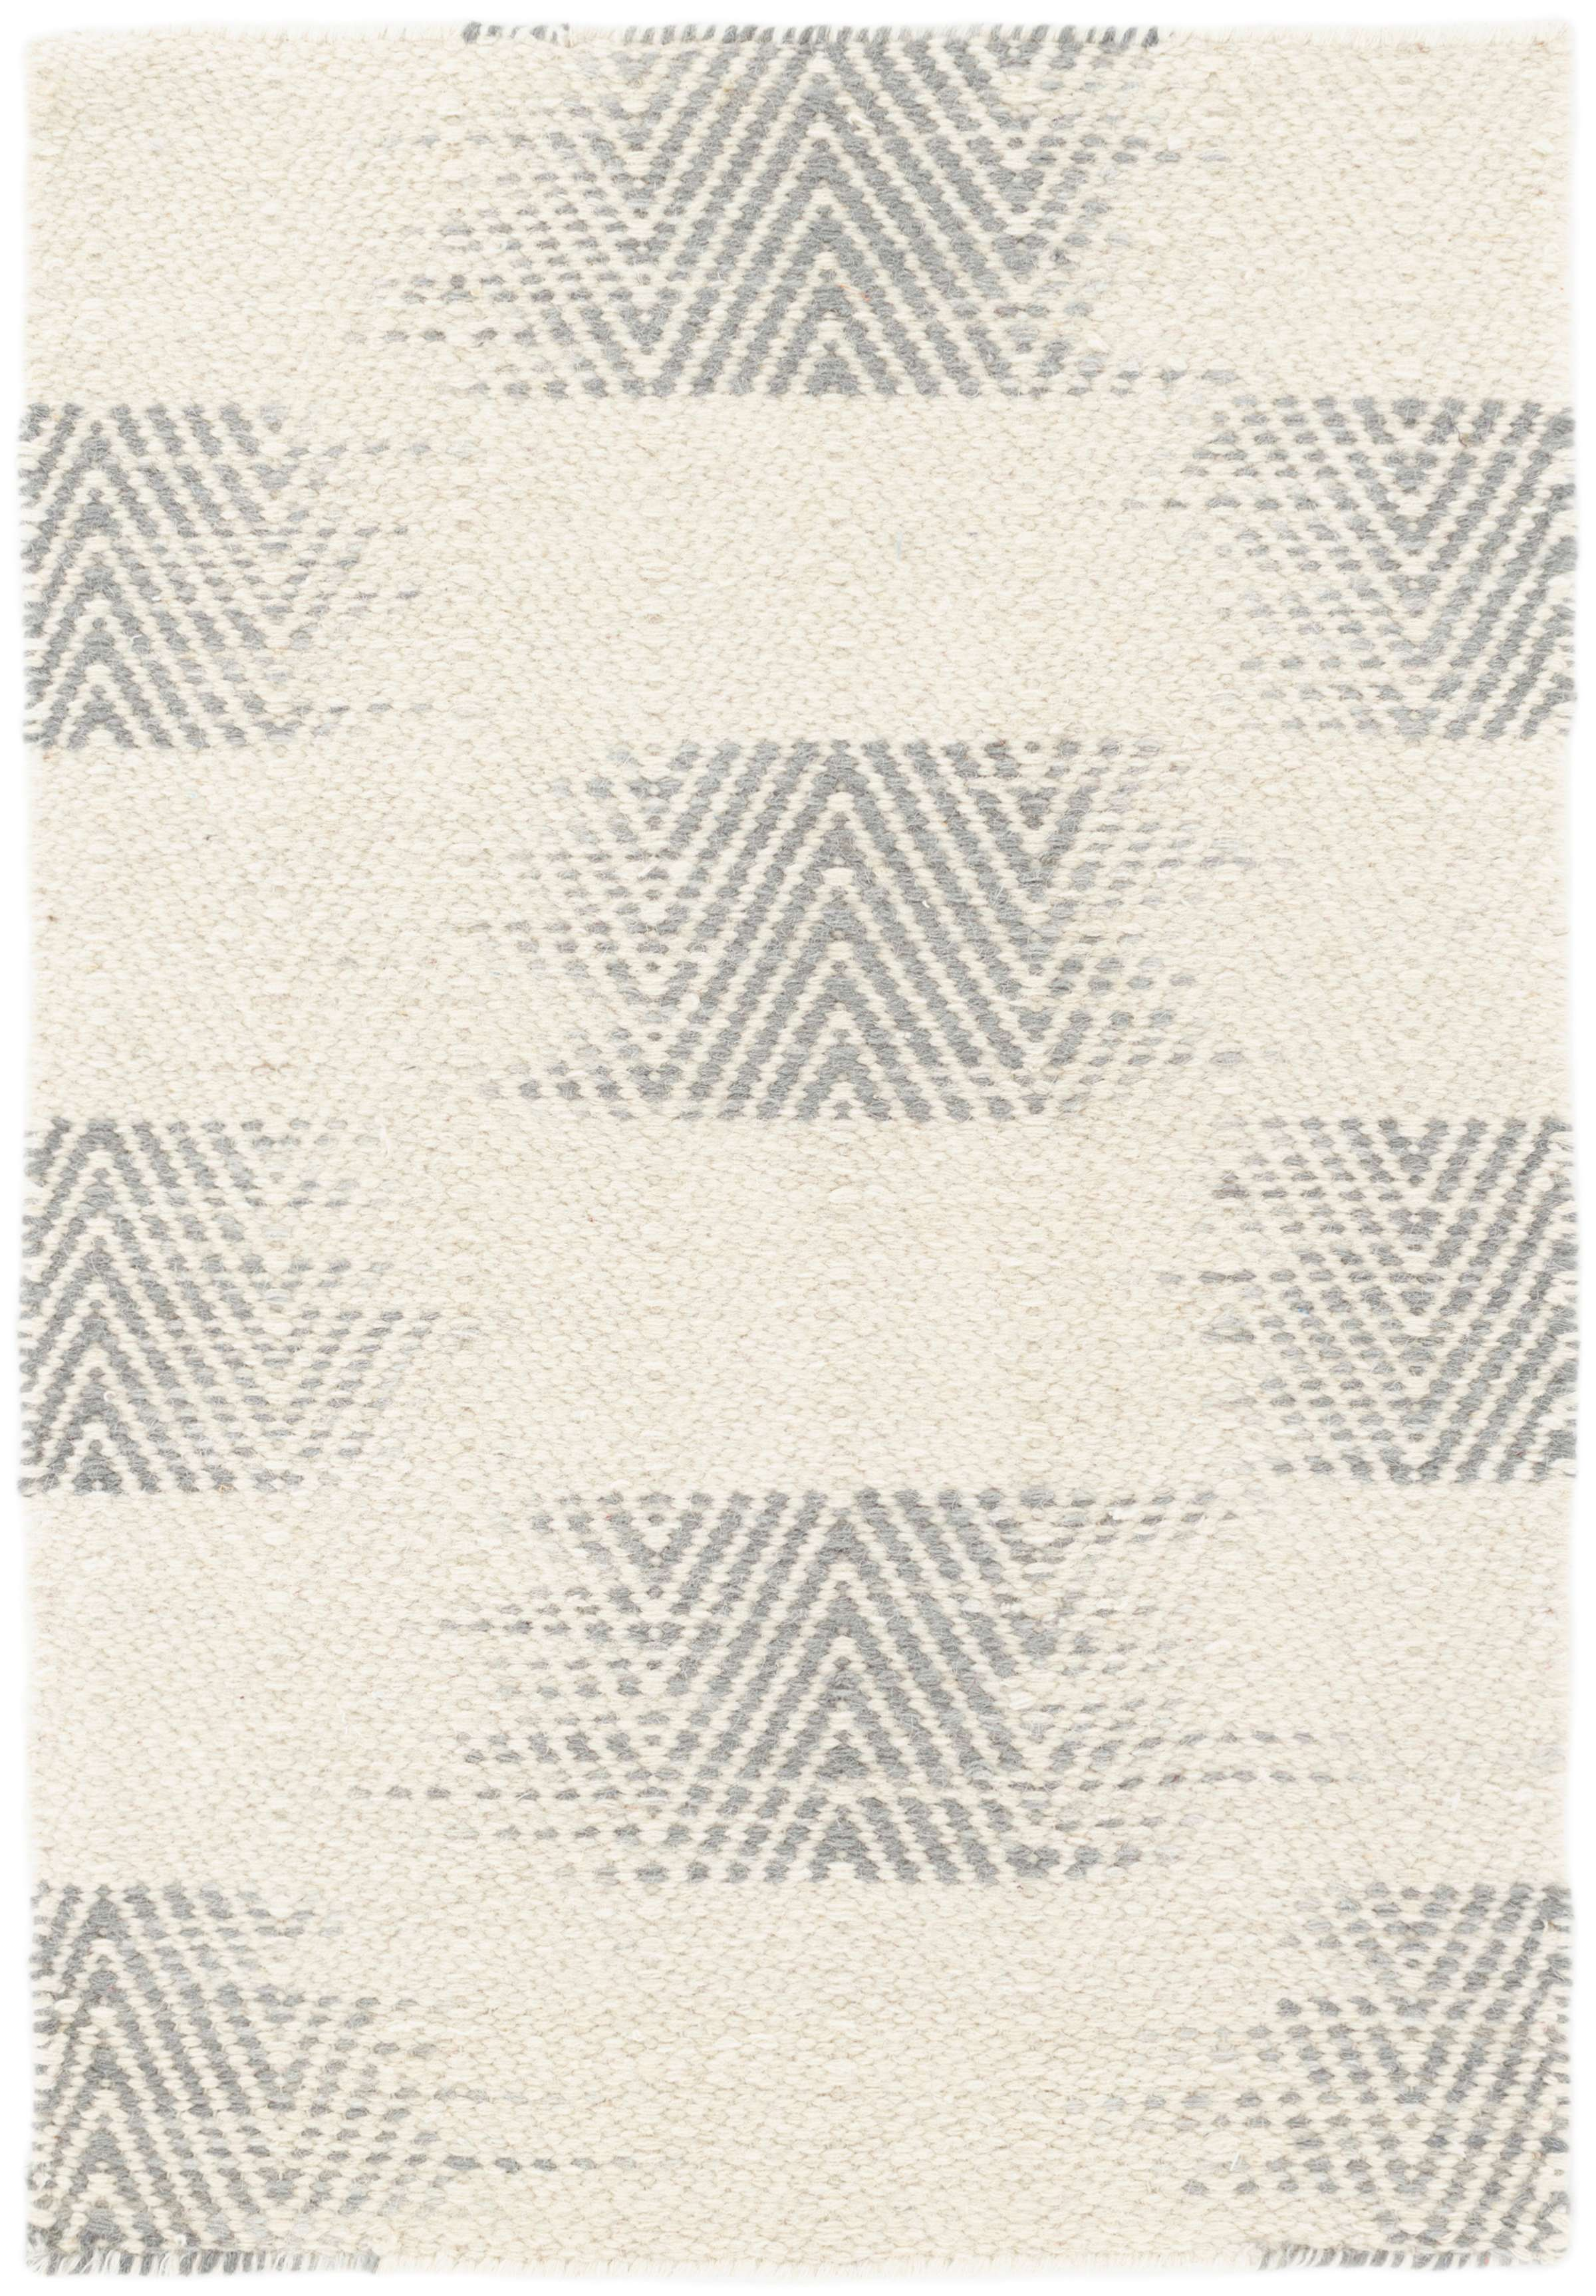 Tansy Grey Woven Wool Rug